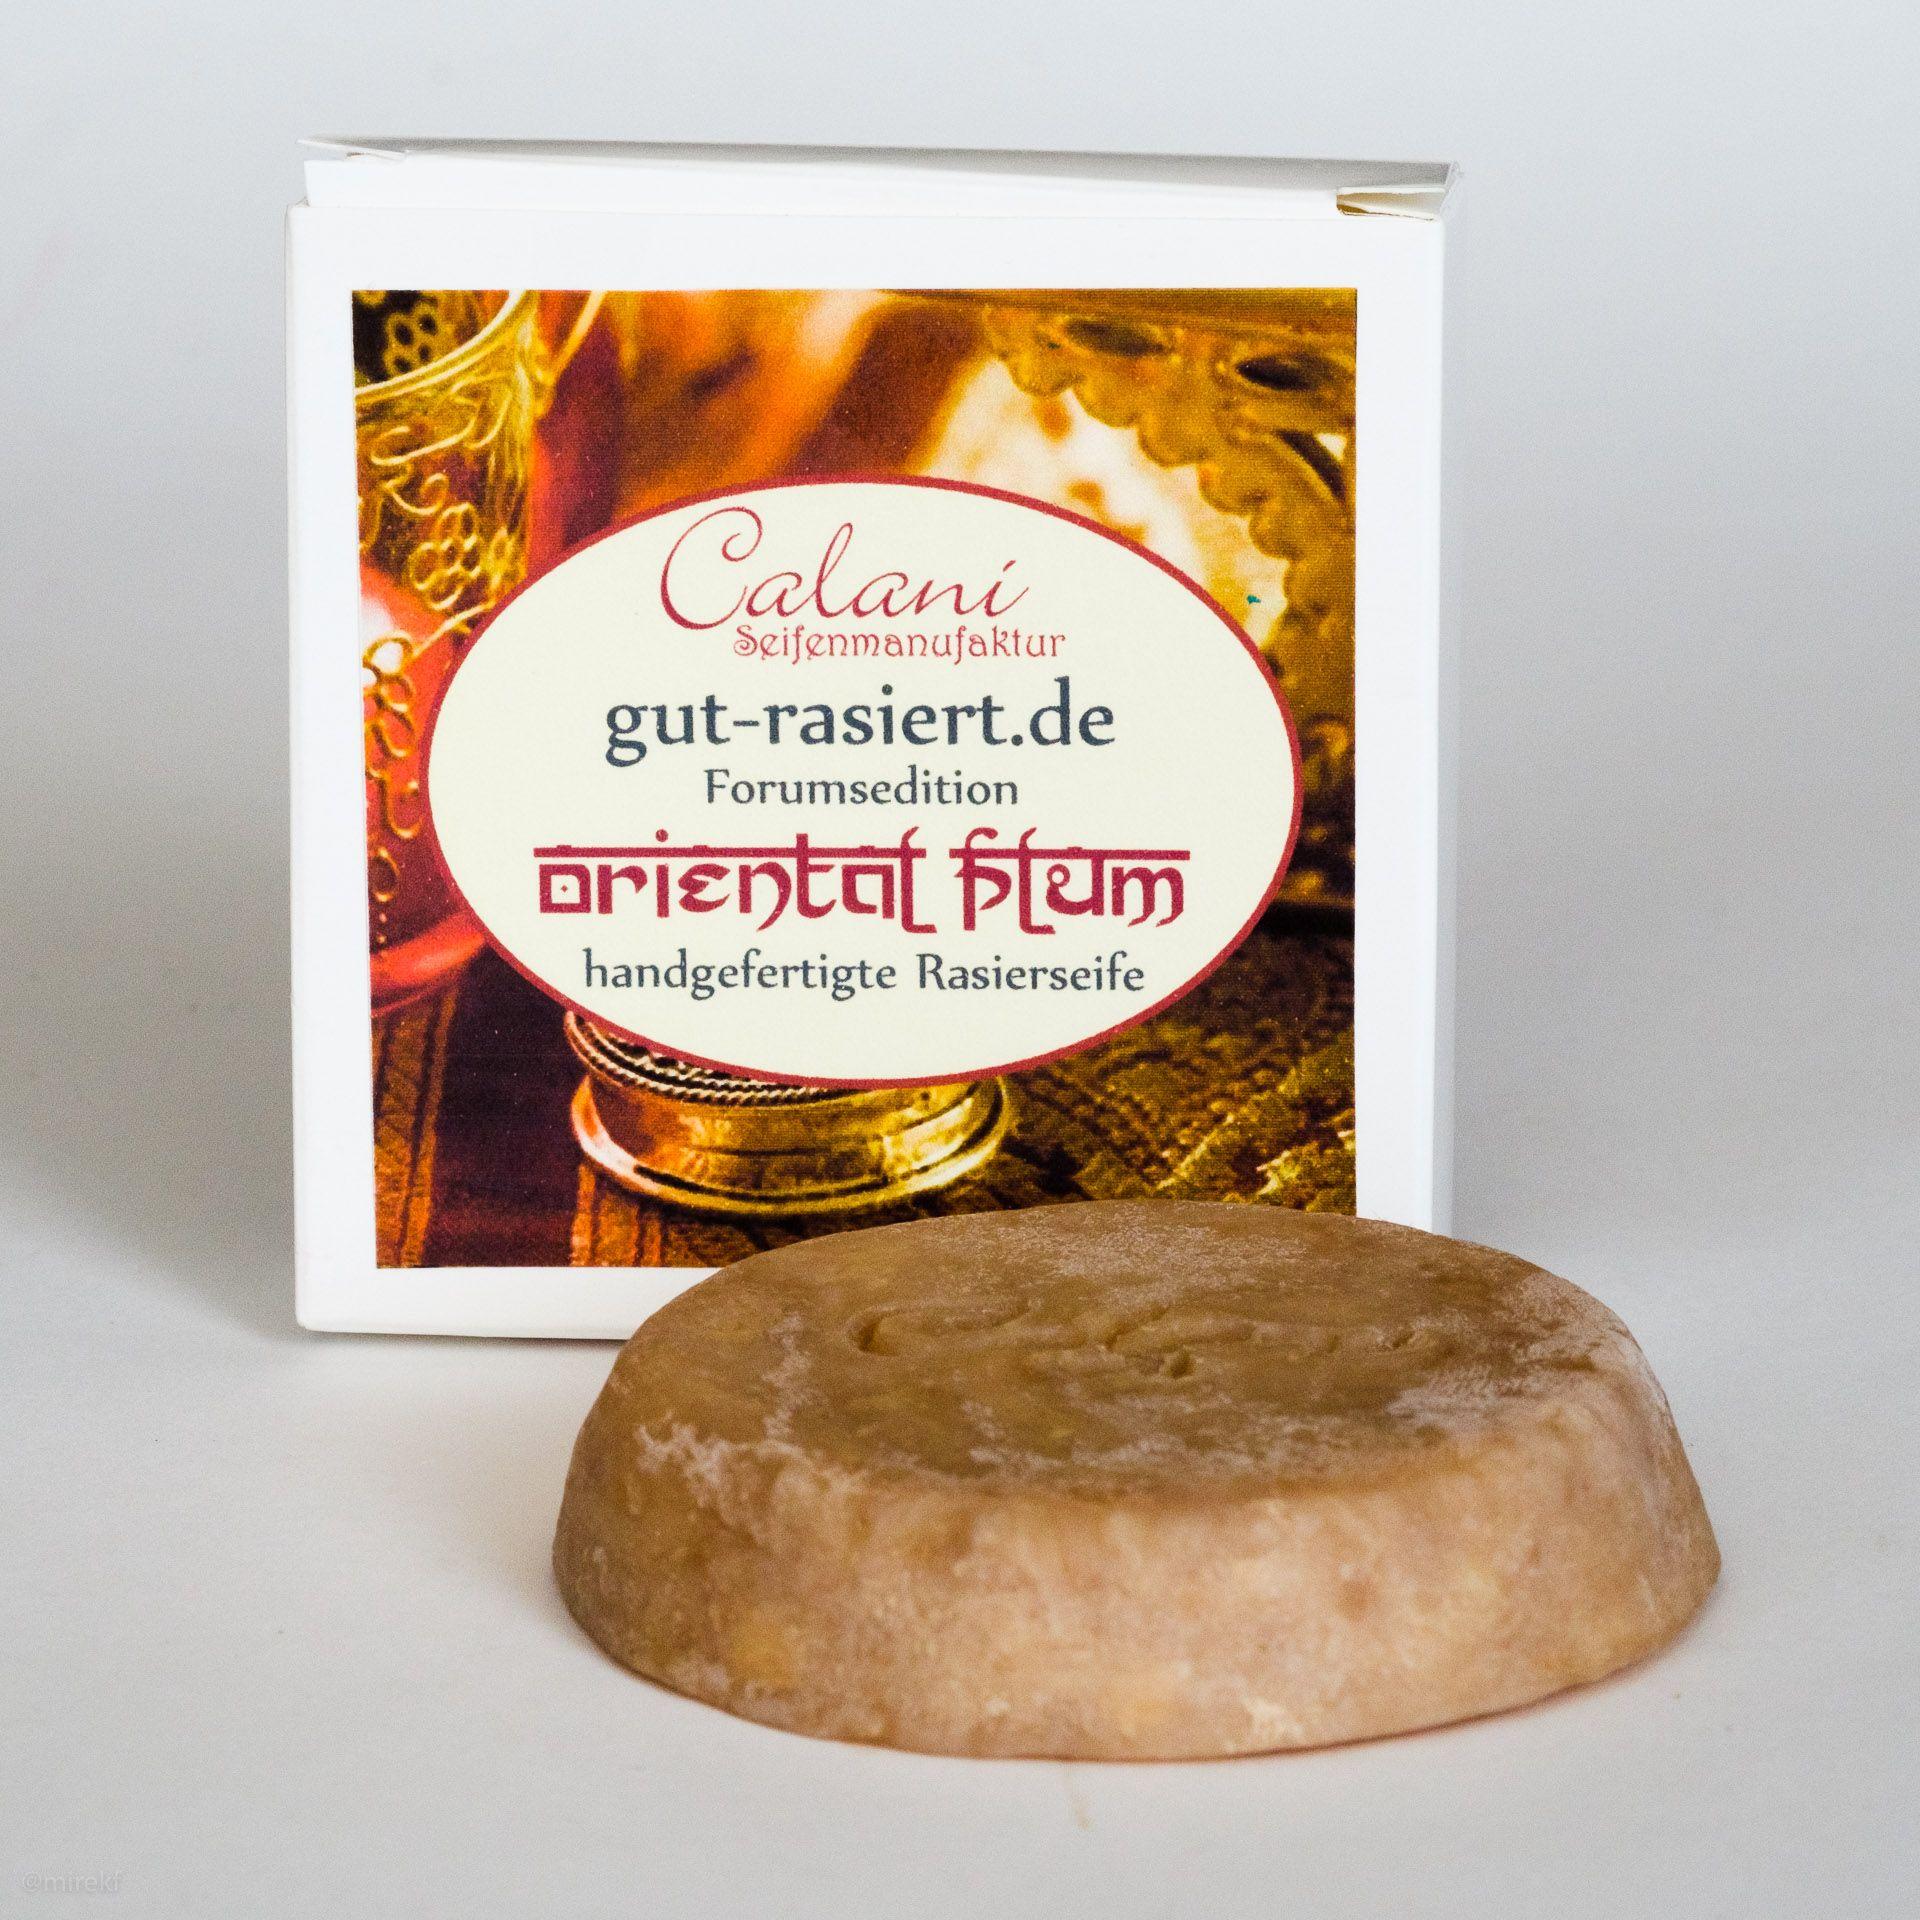 You are currently viewing Calani Oriental Plum Rasierseife (Shaving Soap) – recenzja mydła do golenia